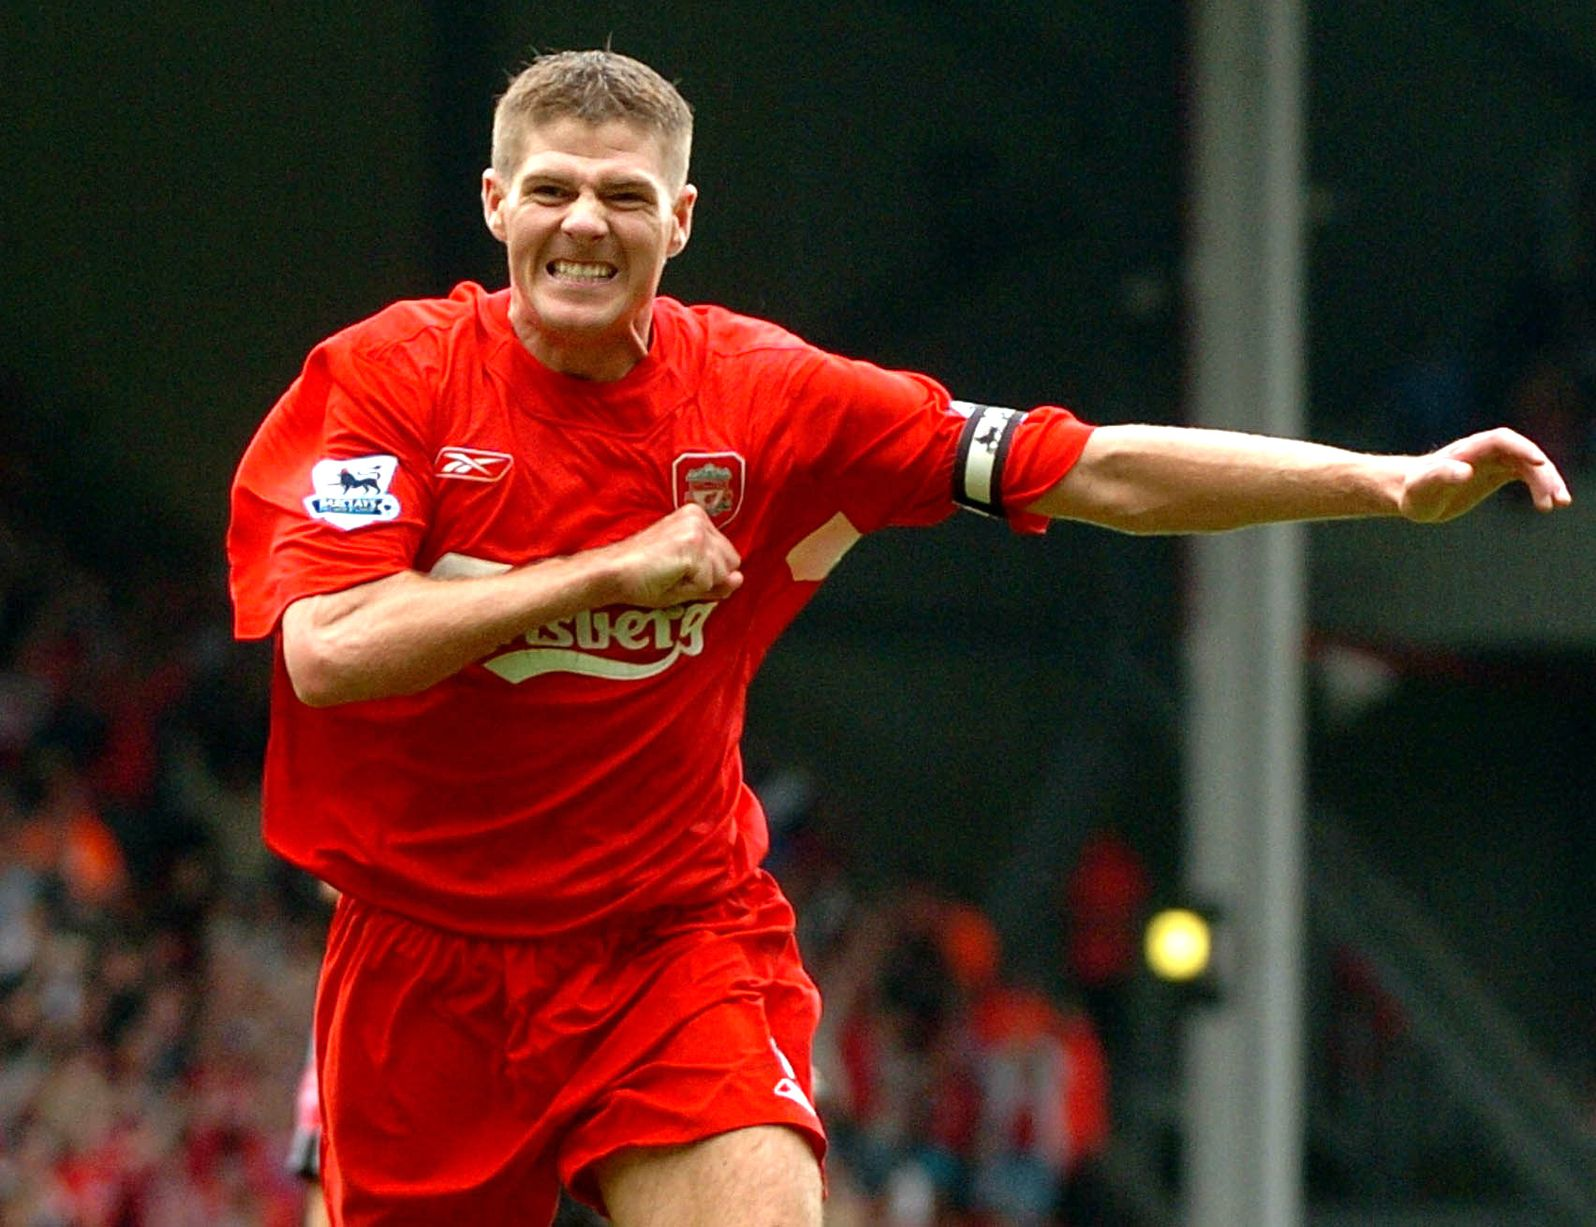 Happy birthday to Liverpool and England legend Steven Gerrard